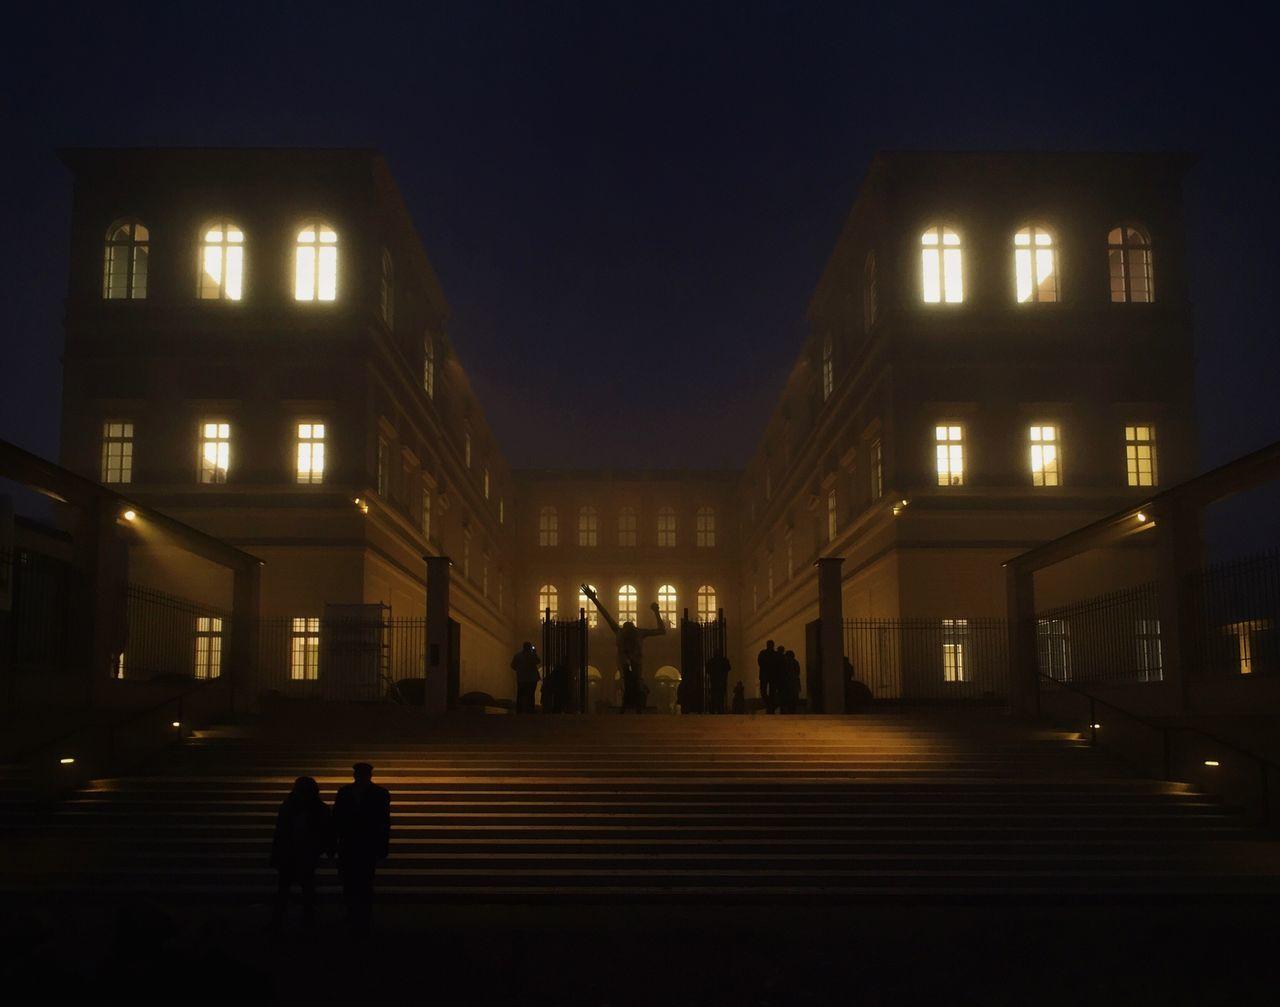 Emptymuseum Museum Barberini Palast Barberini Potsdam Foggy Architecture ZEISS ExoLens Iphone6 Mobilephotography